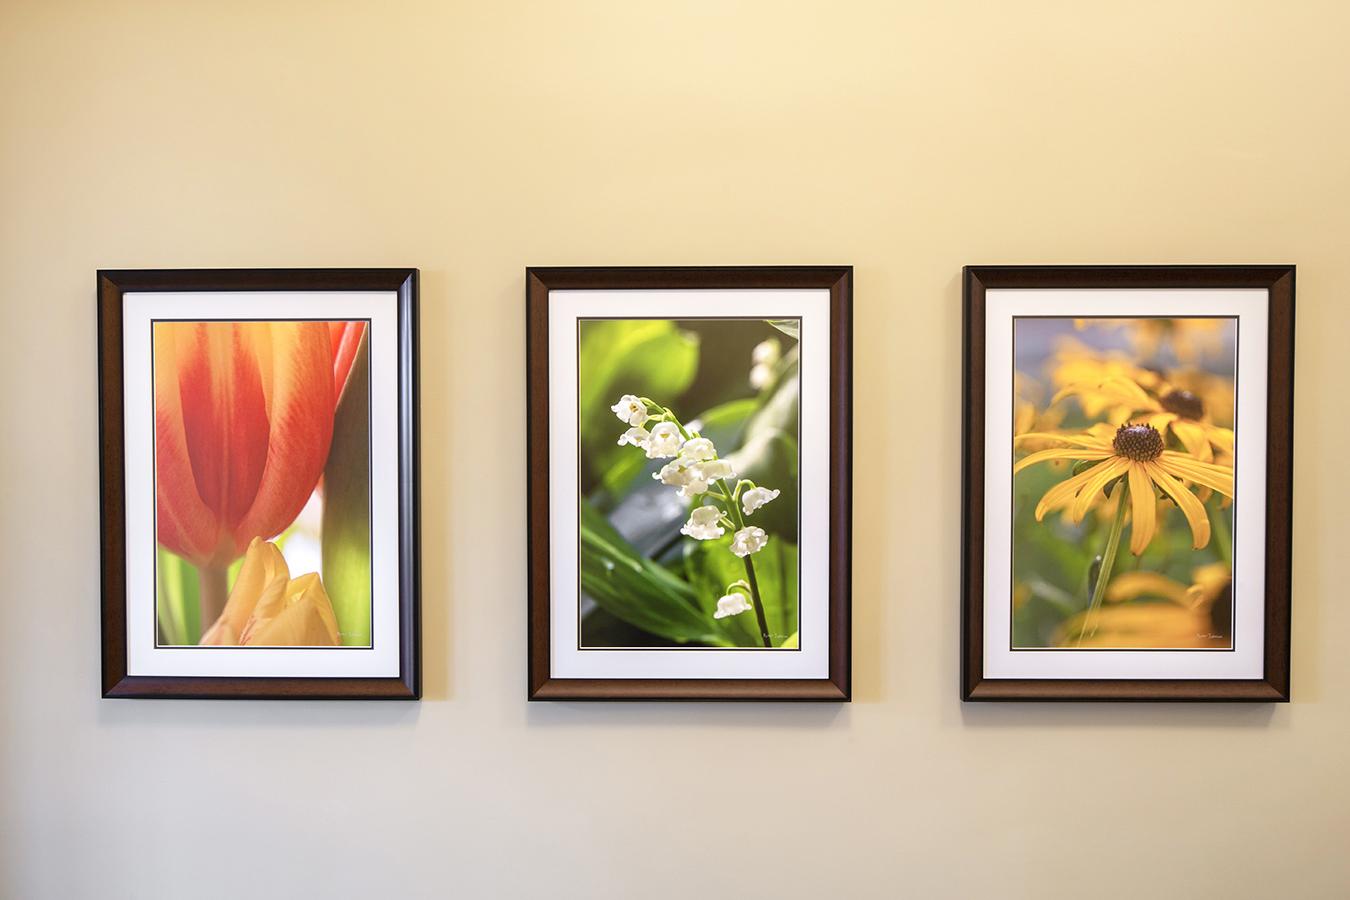 Pender hospital healthcare installation wood framed art flower botanical photography